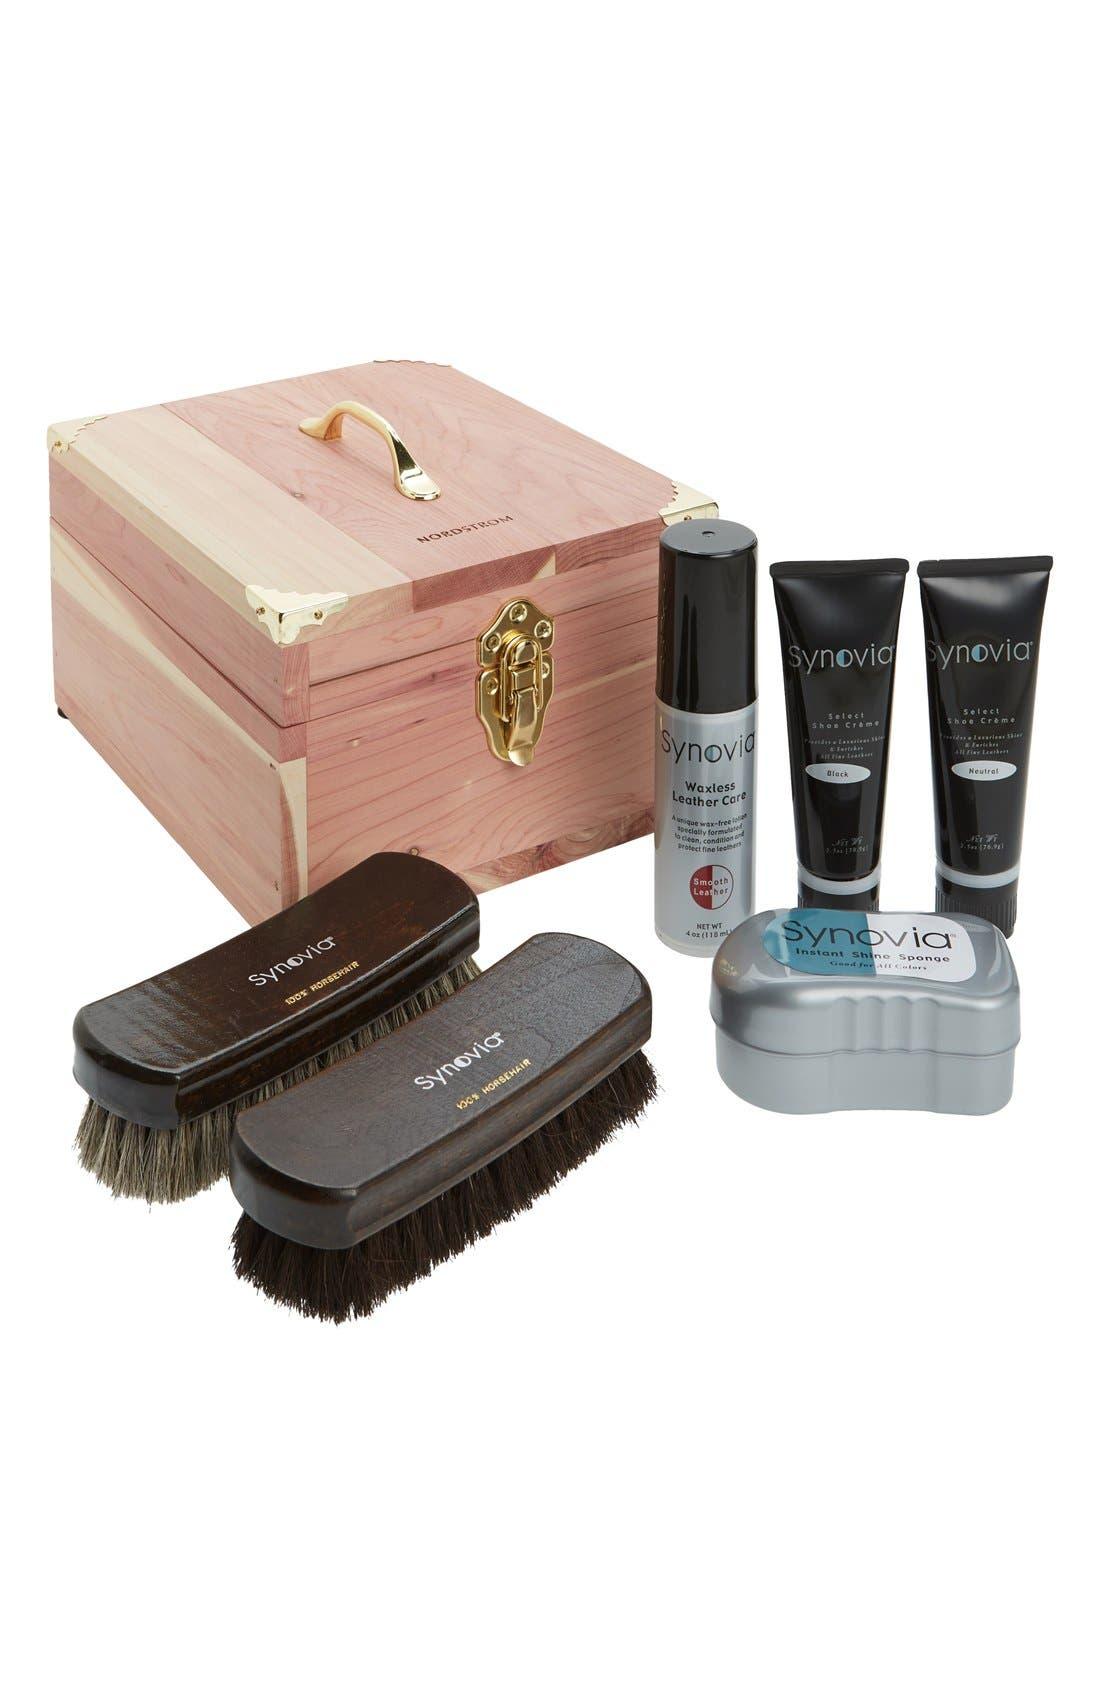 Main Image - Synovia Shoe Care Kit & Deluxe Cedar Box